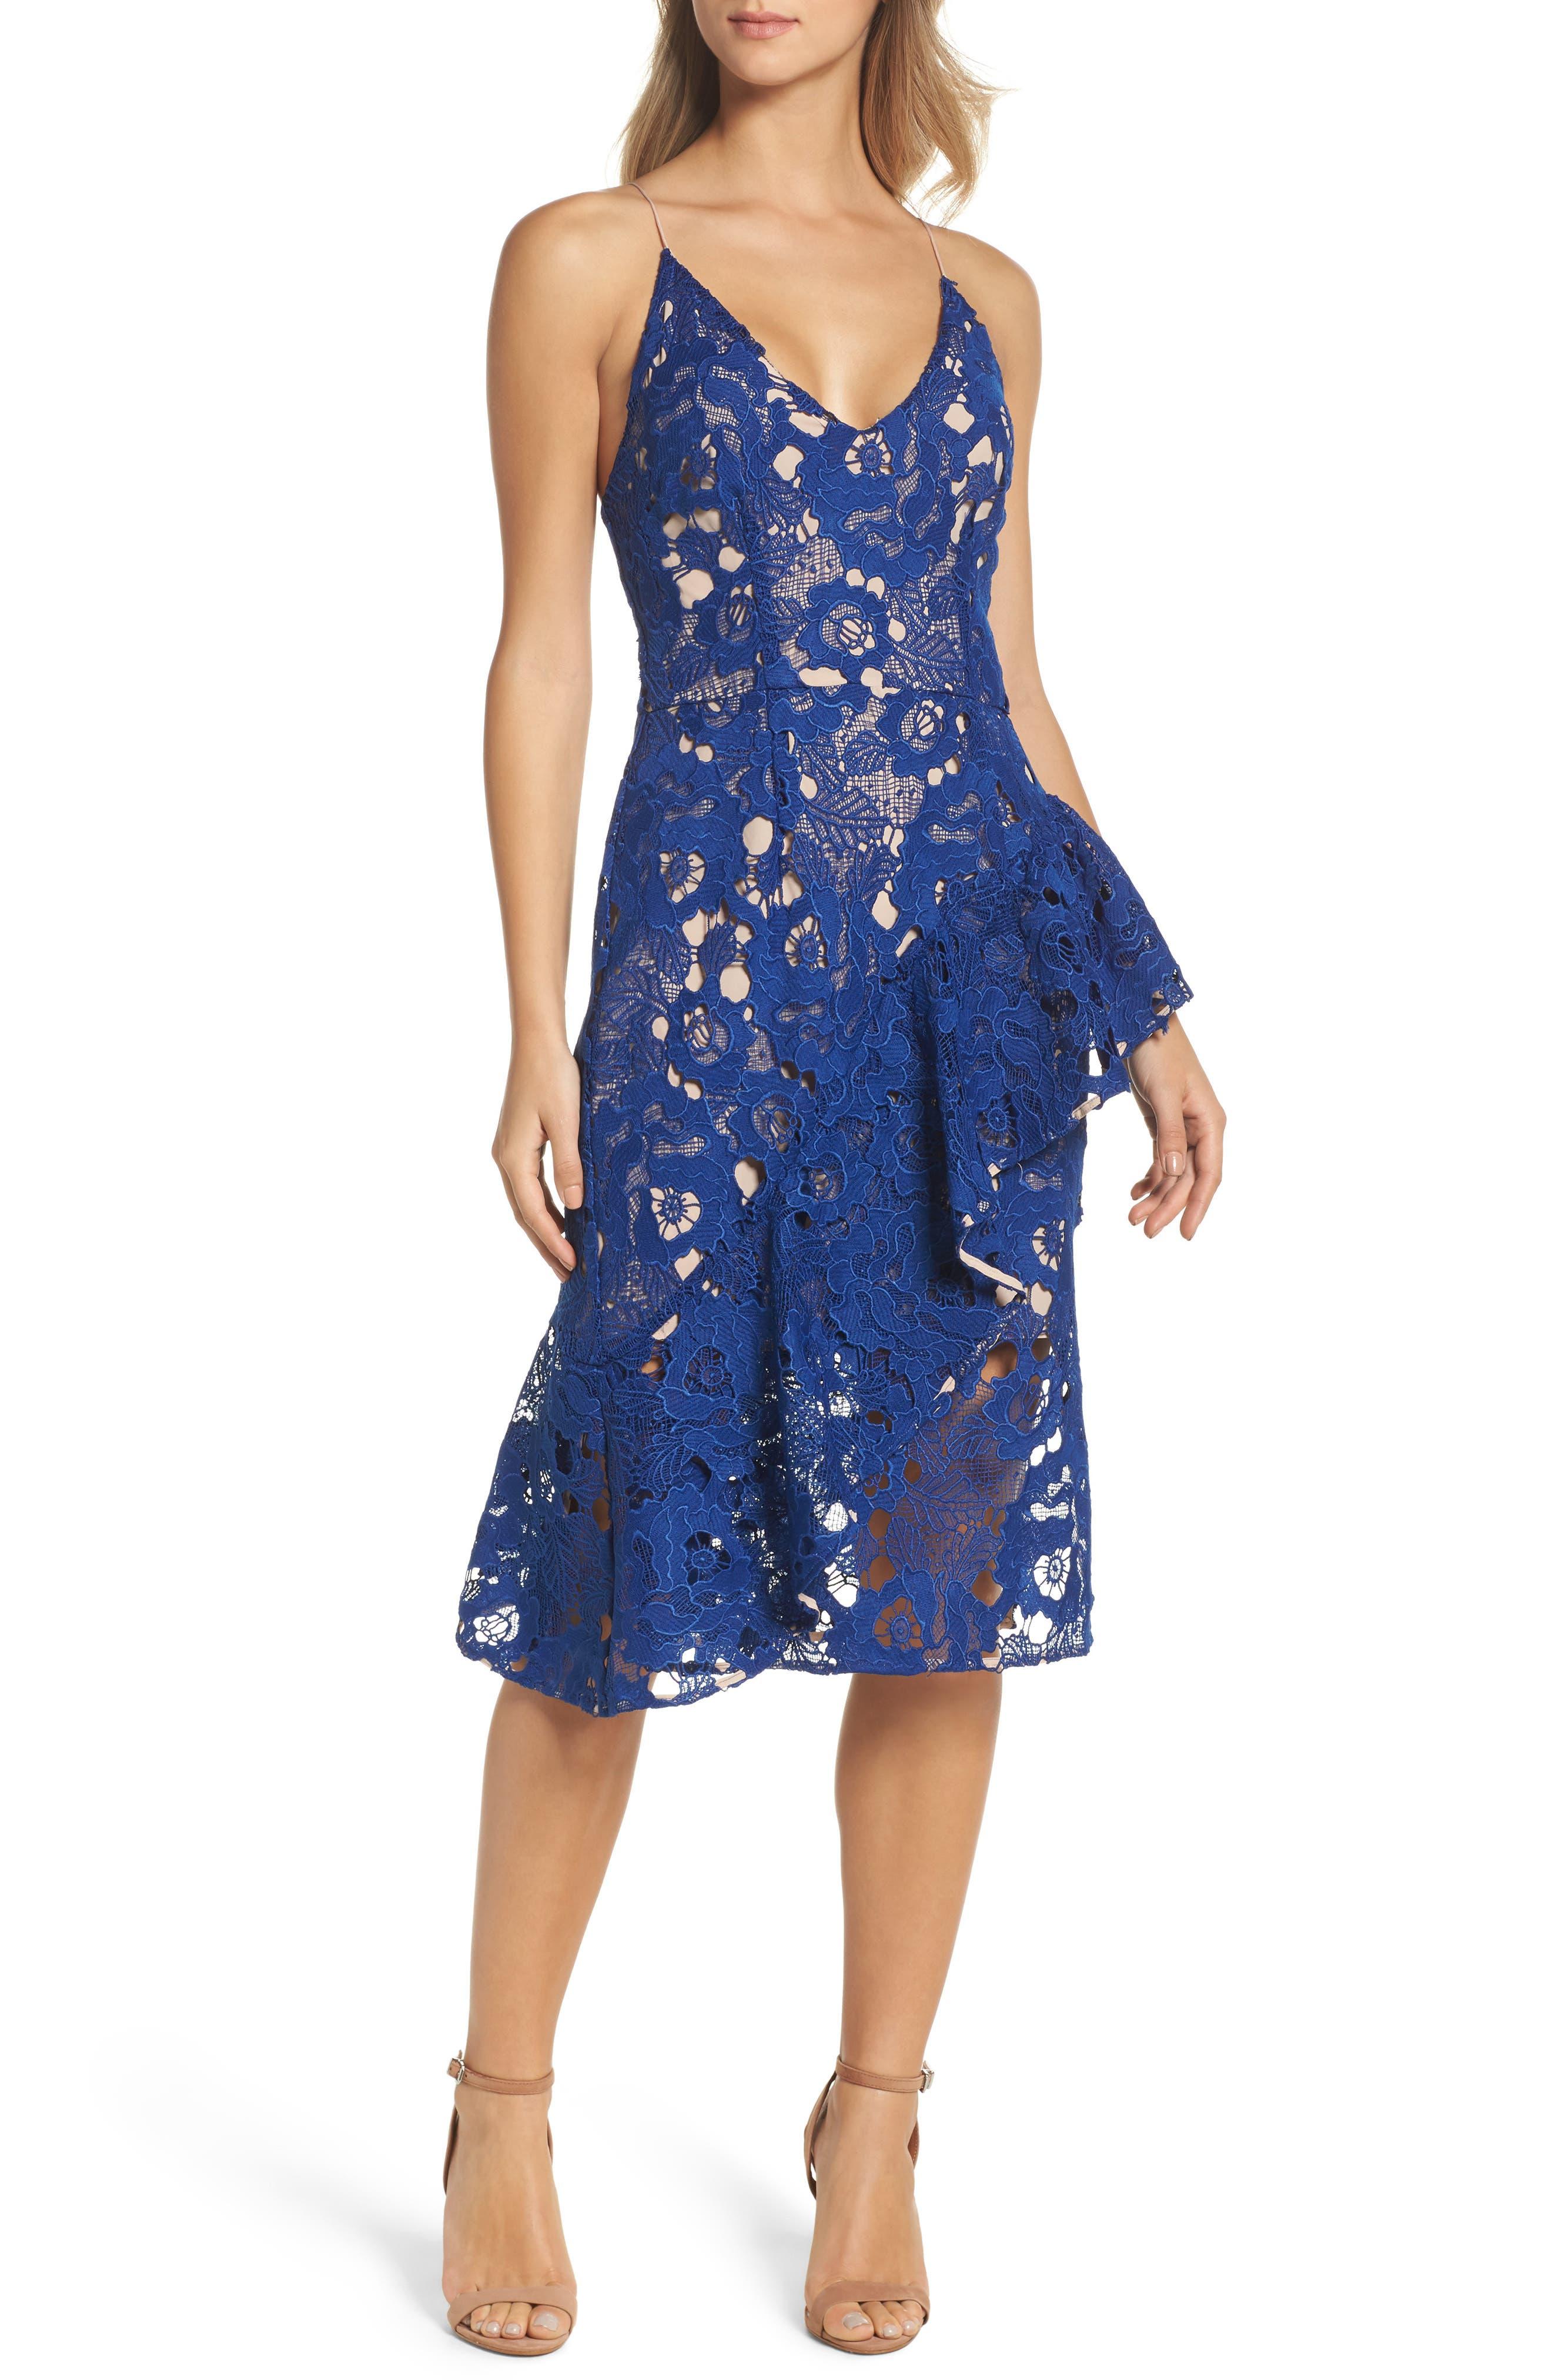 Sky Beauty Lace Ruffle Dress,                             Main thumbnail 1, color,                             Catalina Blue